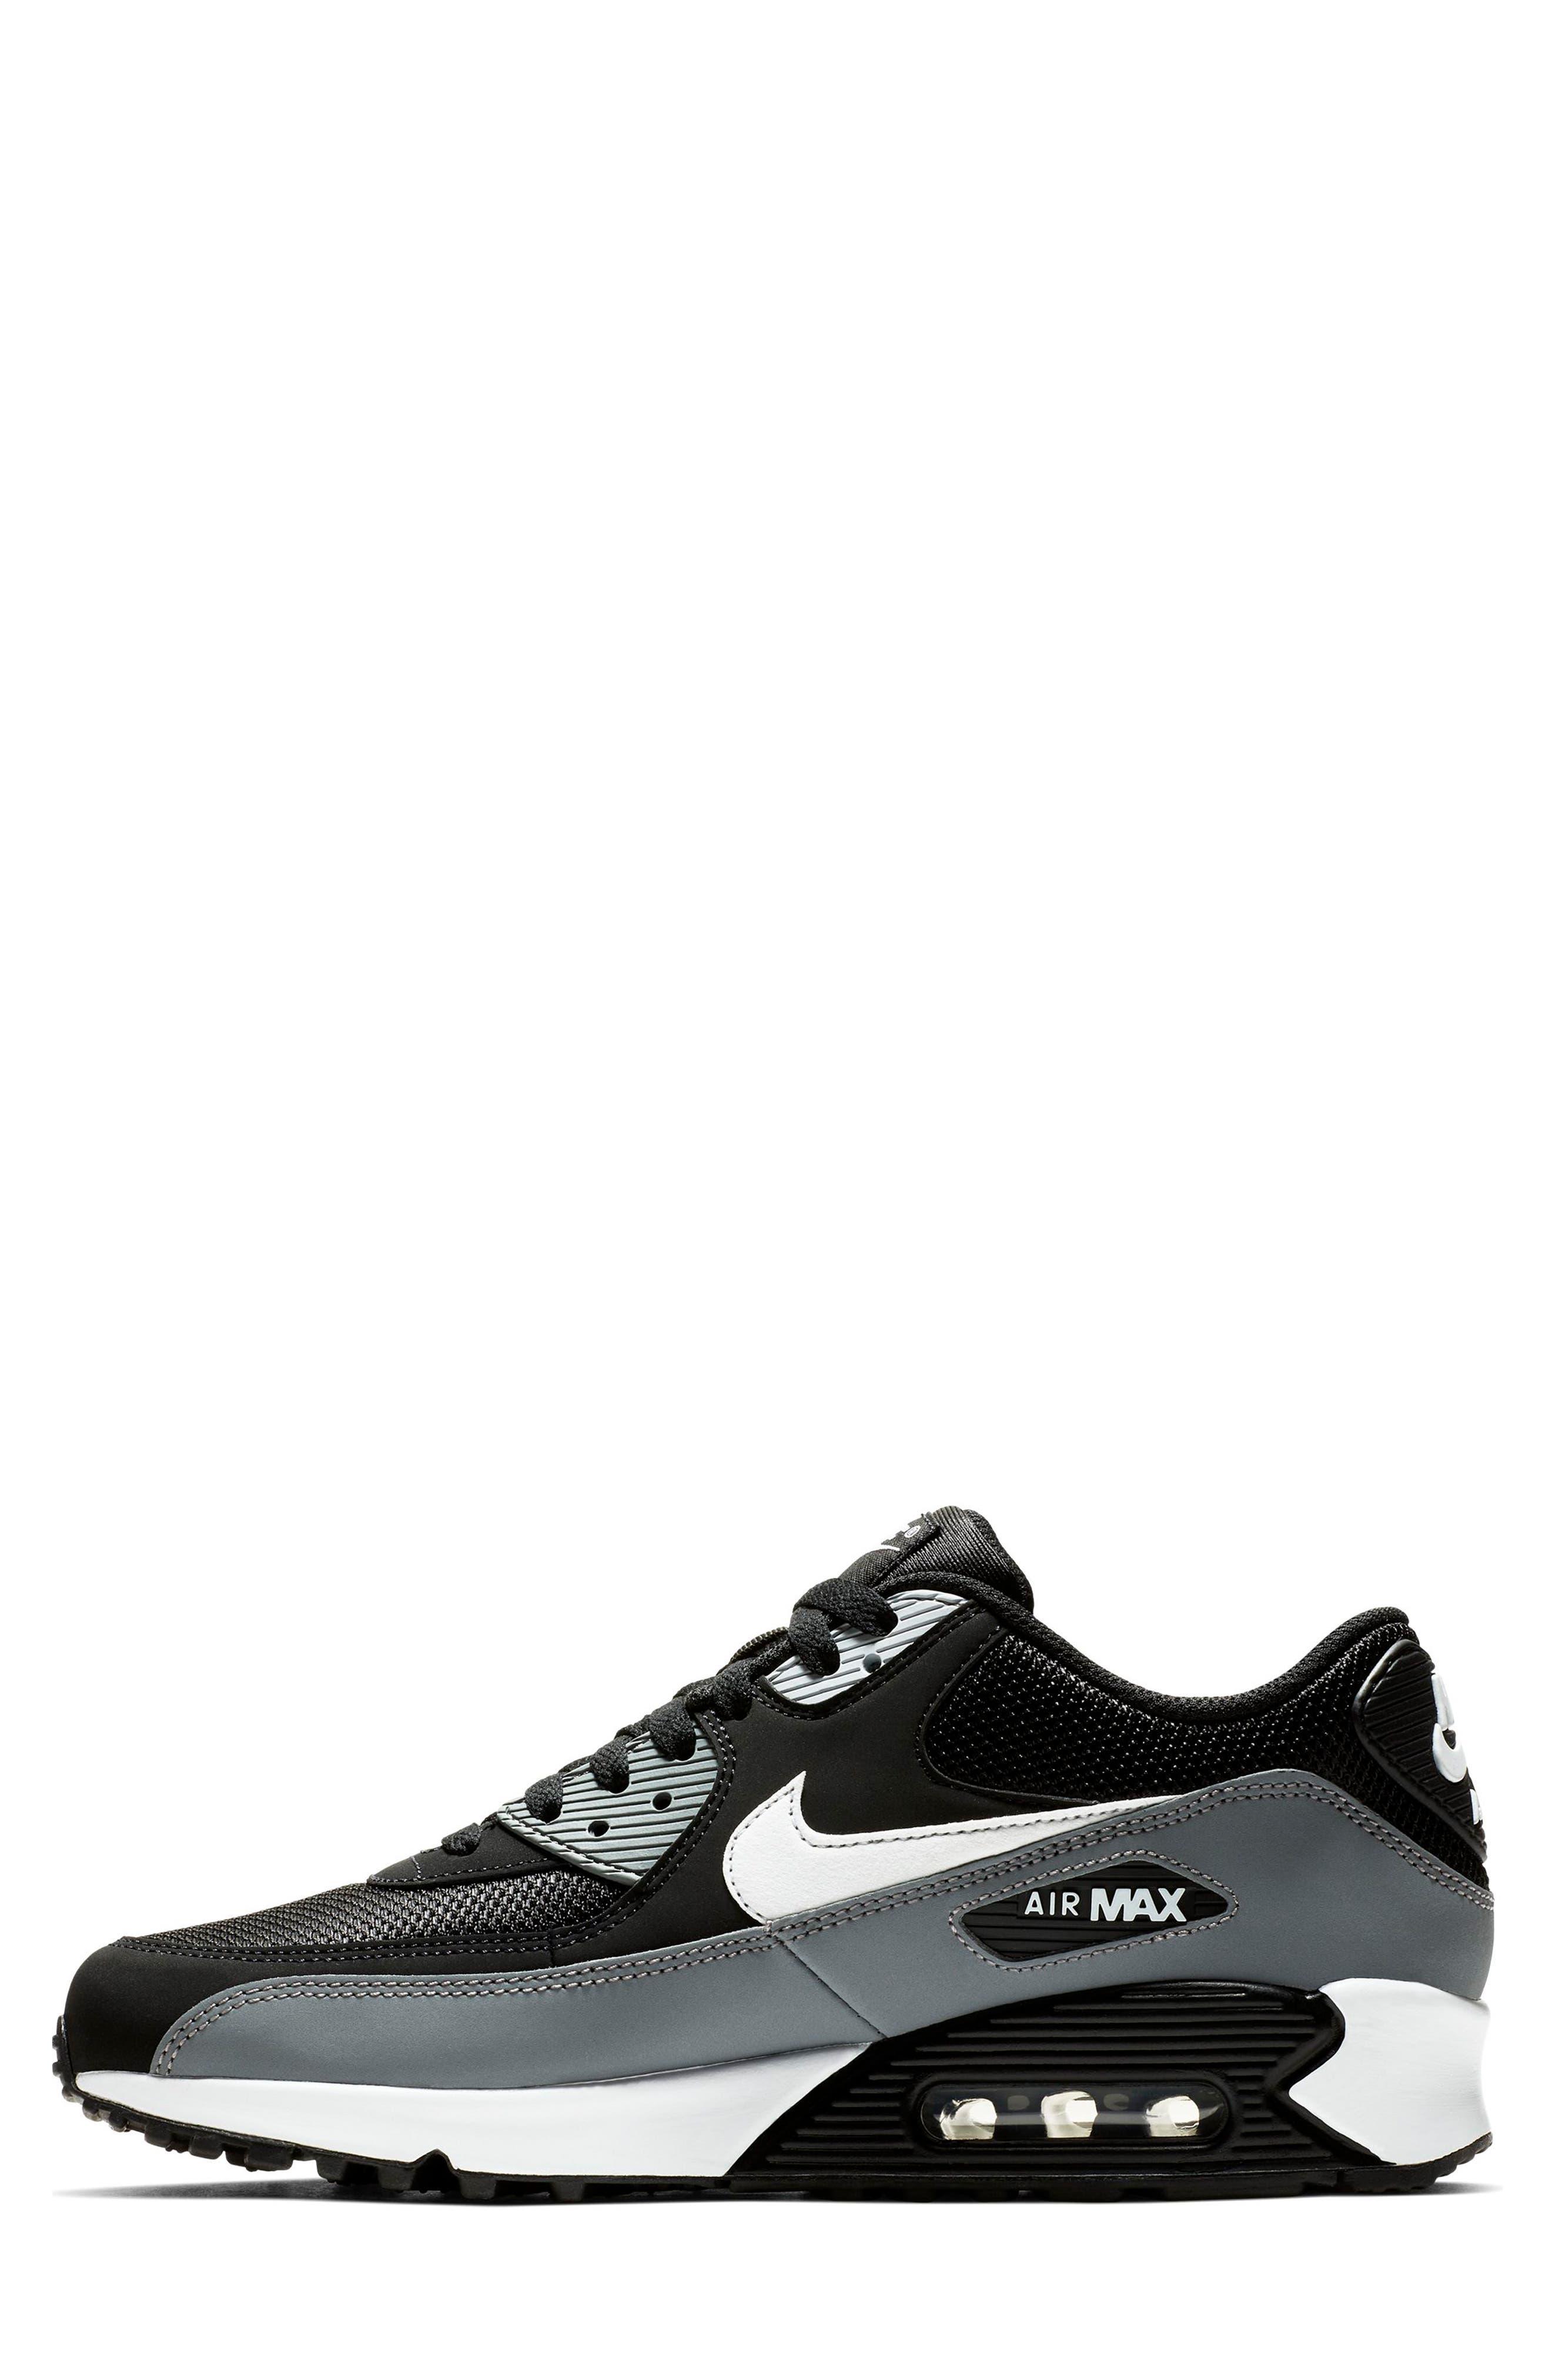 Air Max 90 Essential Sneaker,                             Alternate thumbnail 6, color,                             BLACK/ WHITE/ COOL GREY